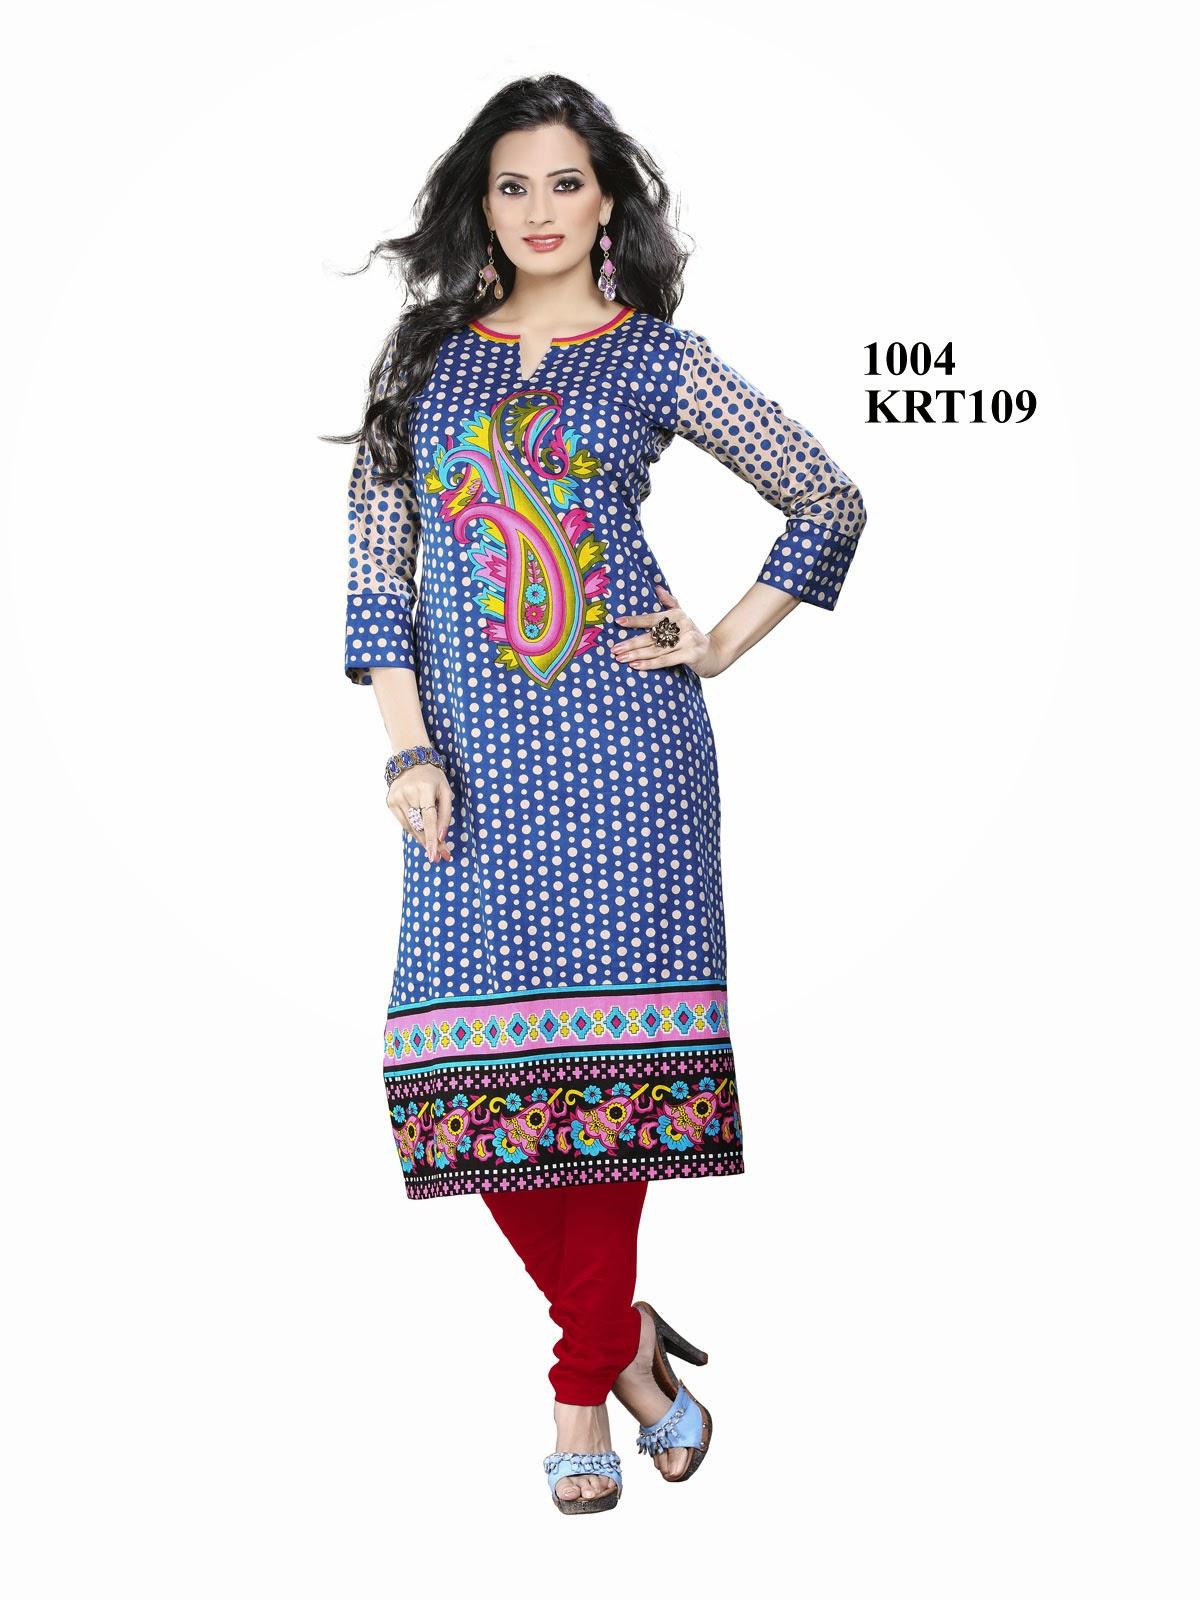 Kurti shopping online india